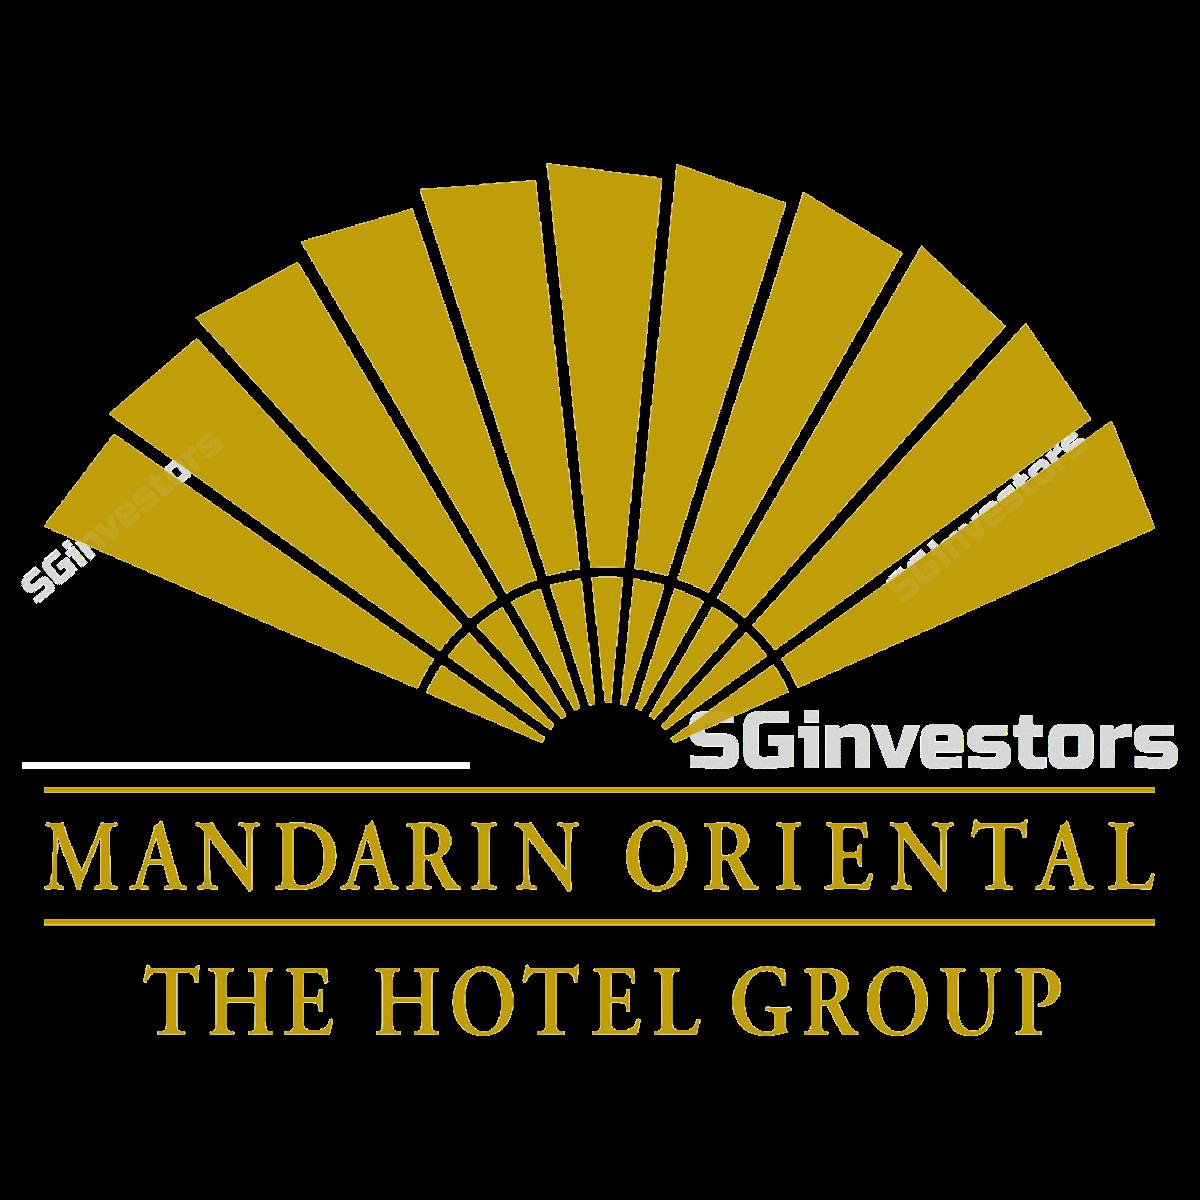 MANDARIN ORIENTAL INTL LTD (SGX:M04) @ SGinvestors.io